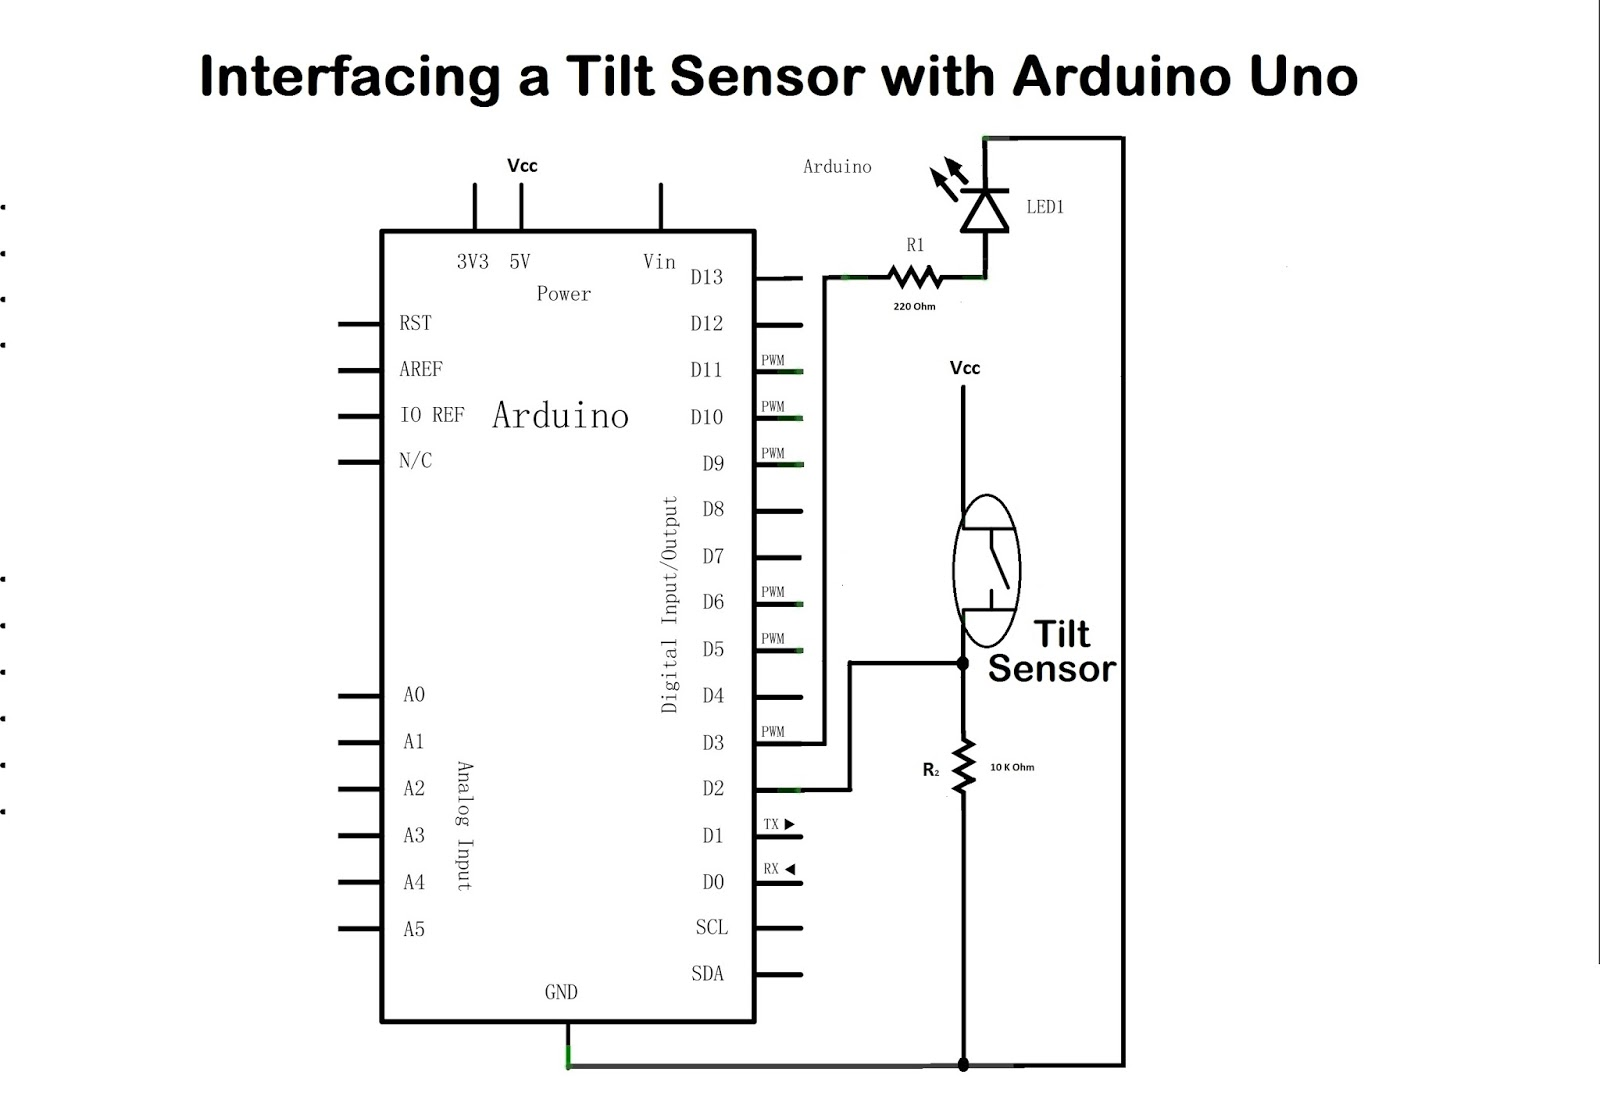 Tilt Sensor Wiring Diagram Great Installation Of Linear Actuator 220v Library Rh 57 Skriptoase De Pa 03